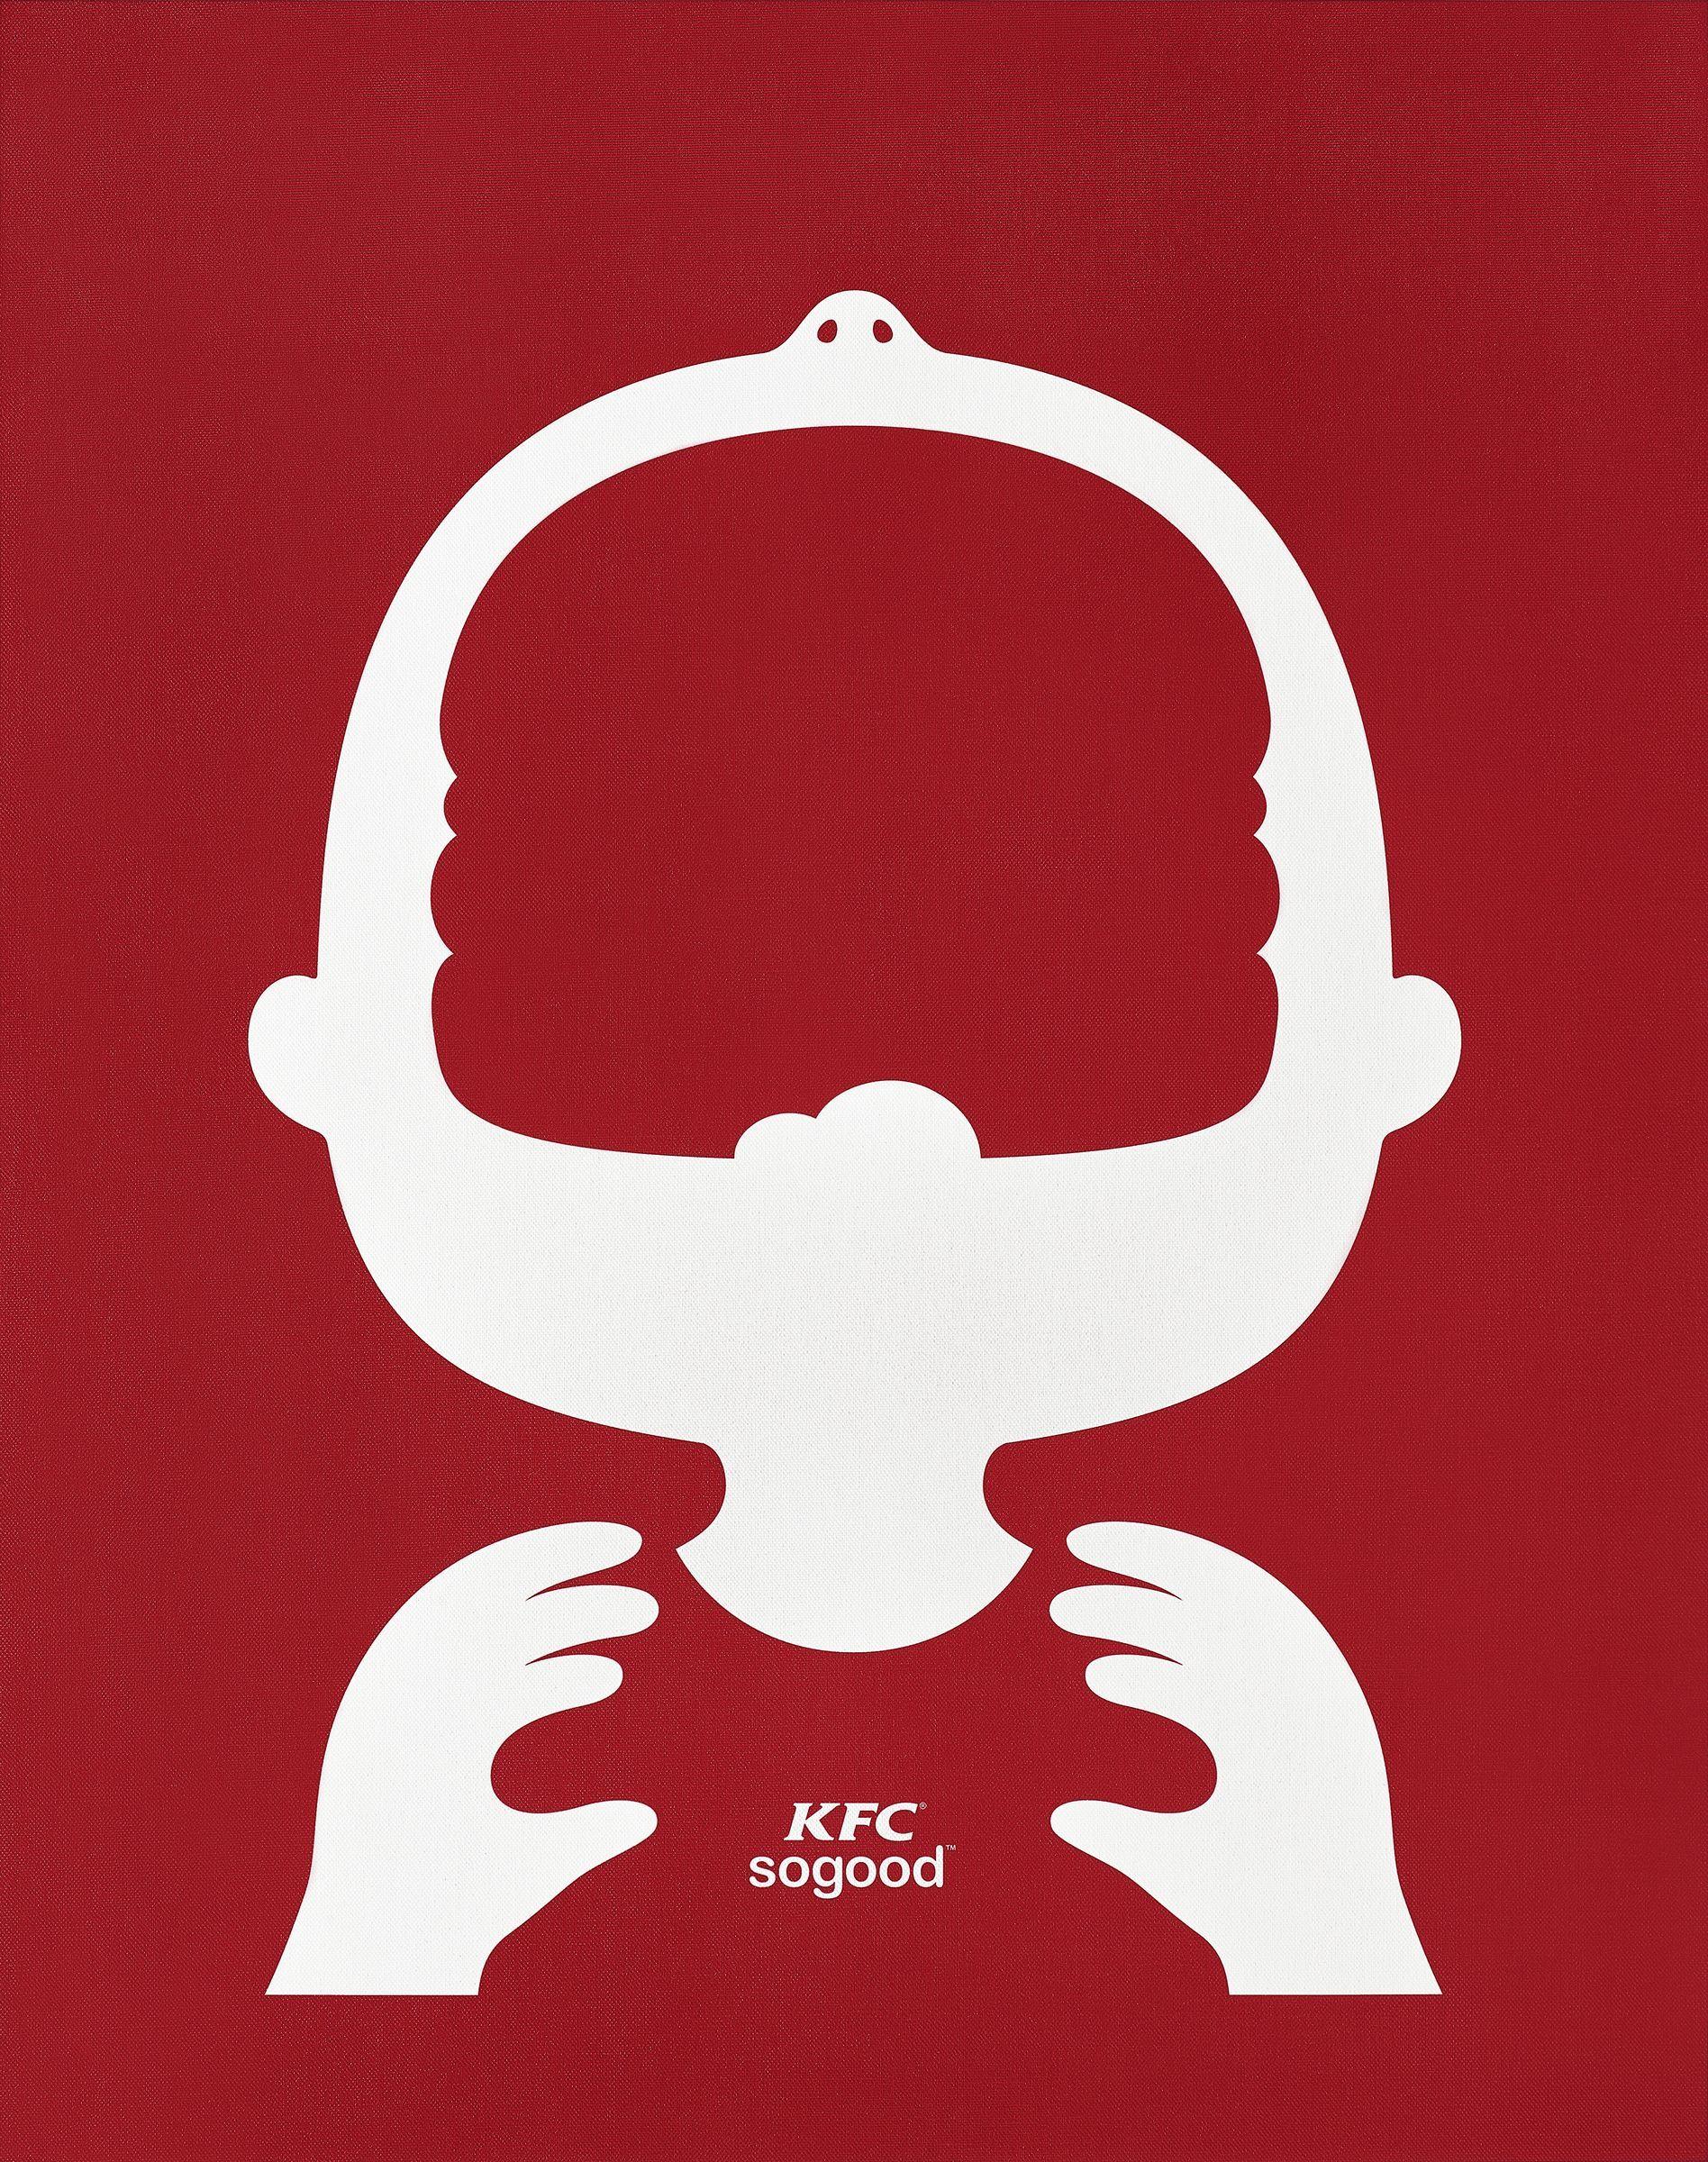 So Good | Creative Simple Illustration KFC Advertising ...